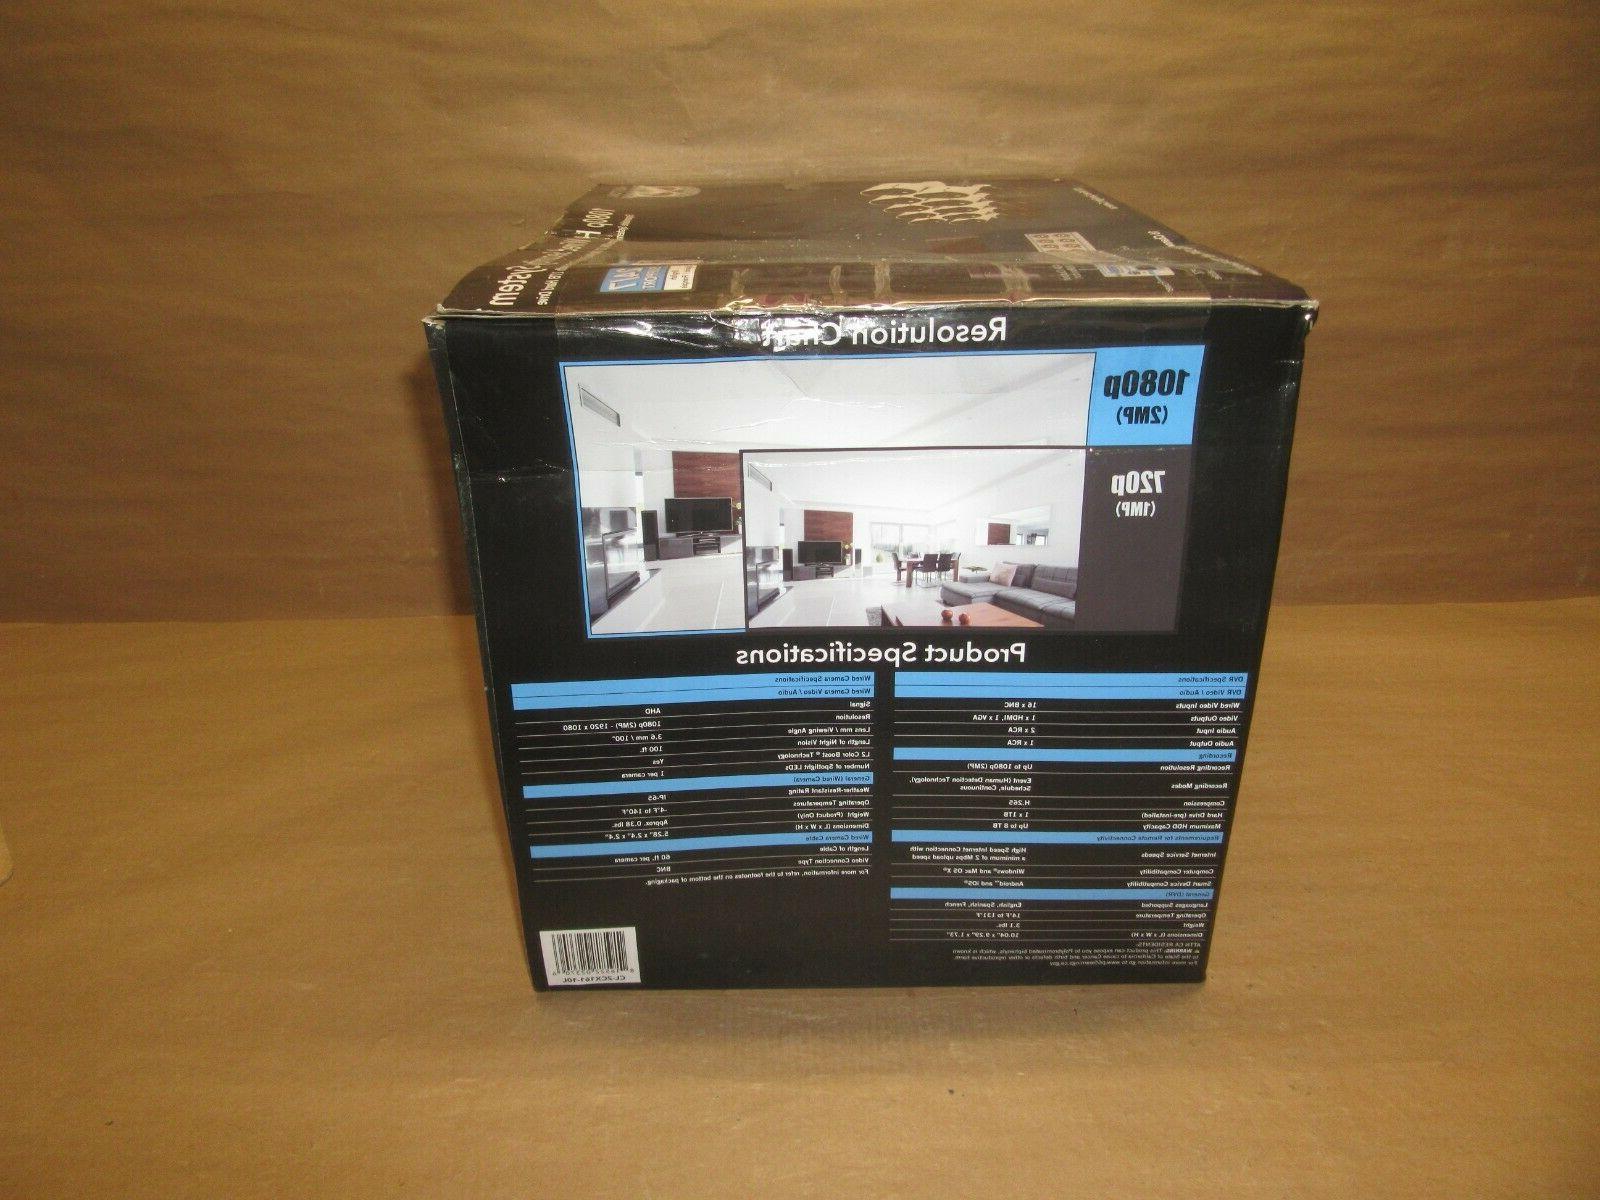 Ch HD Cameras